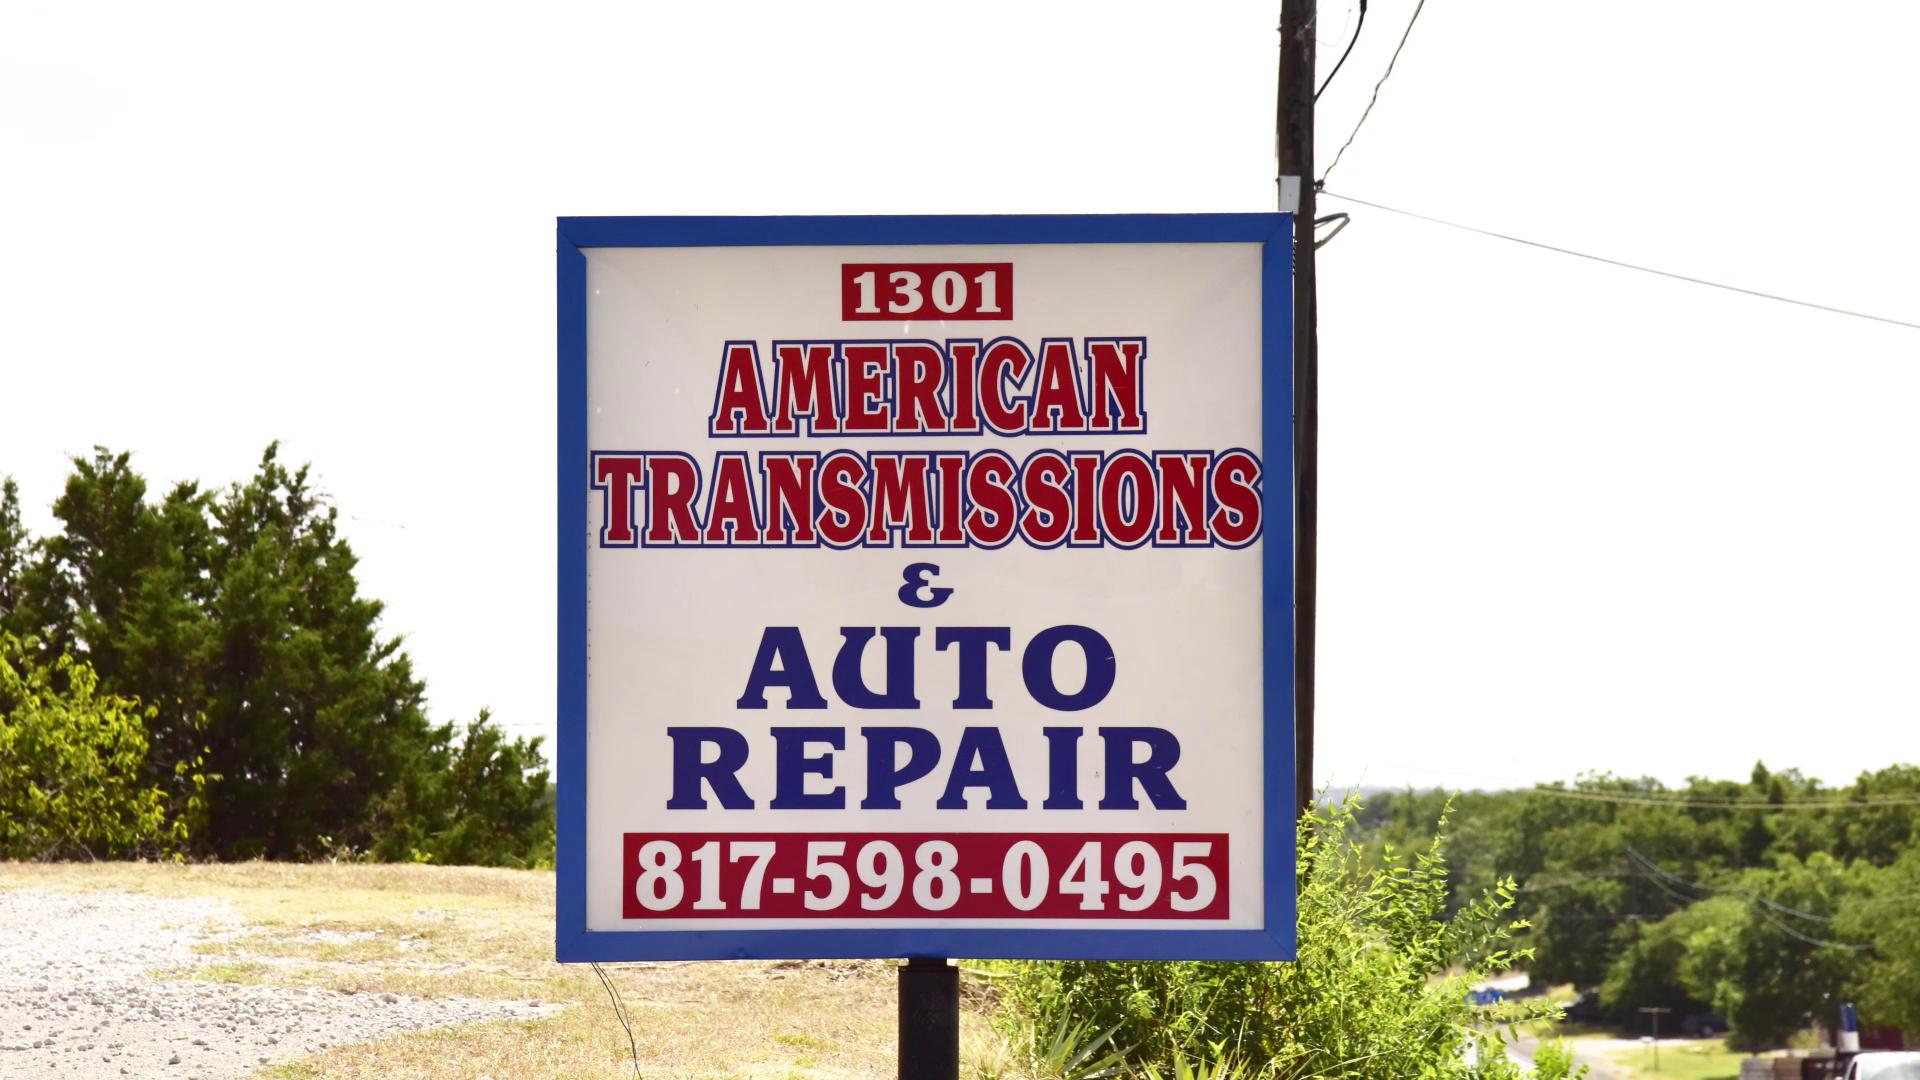 AmericanTransmissionsAuto